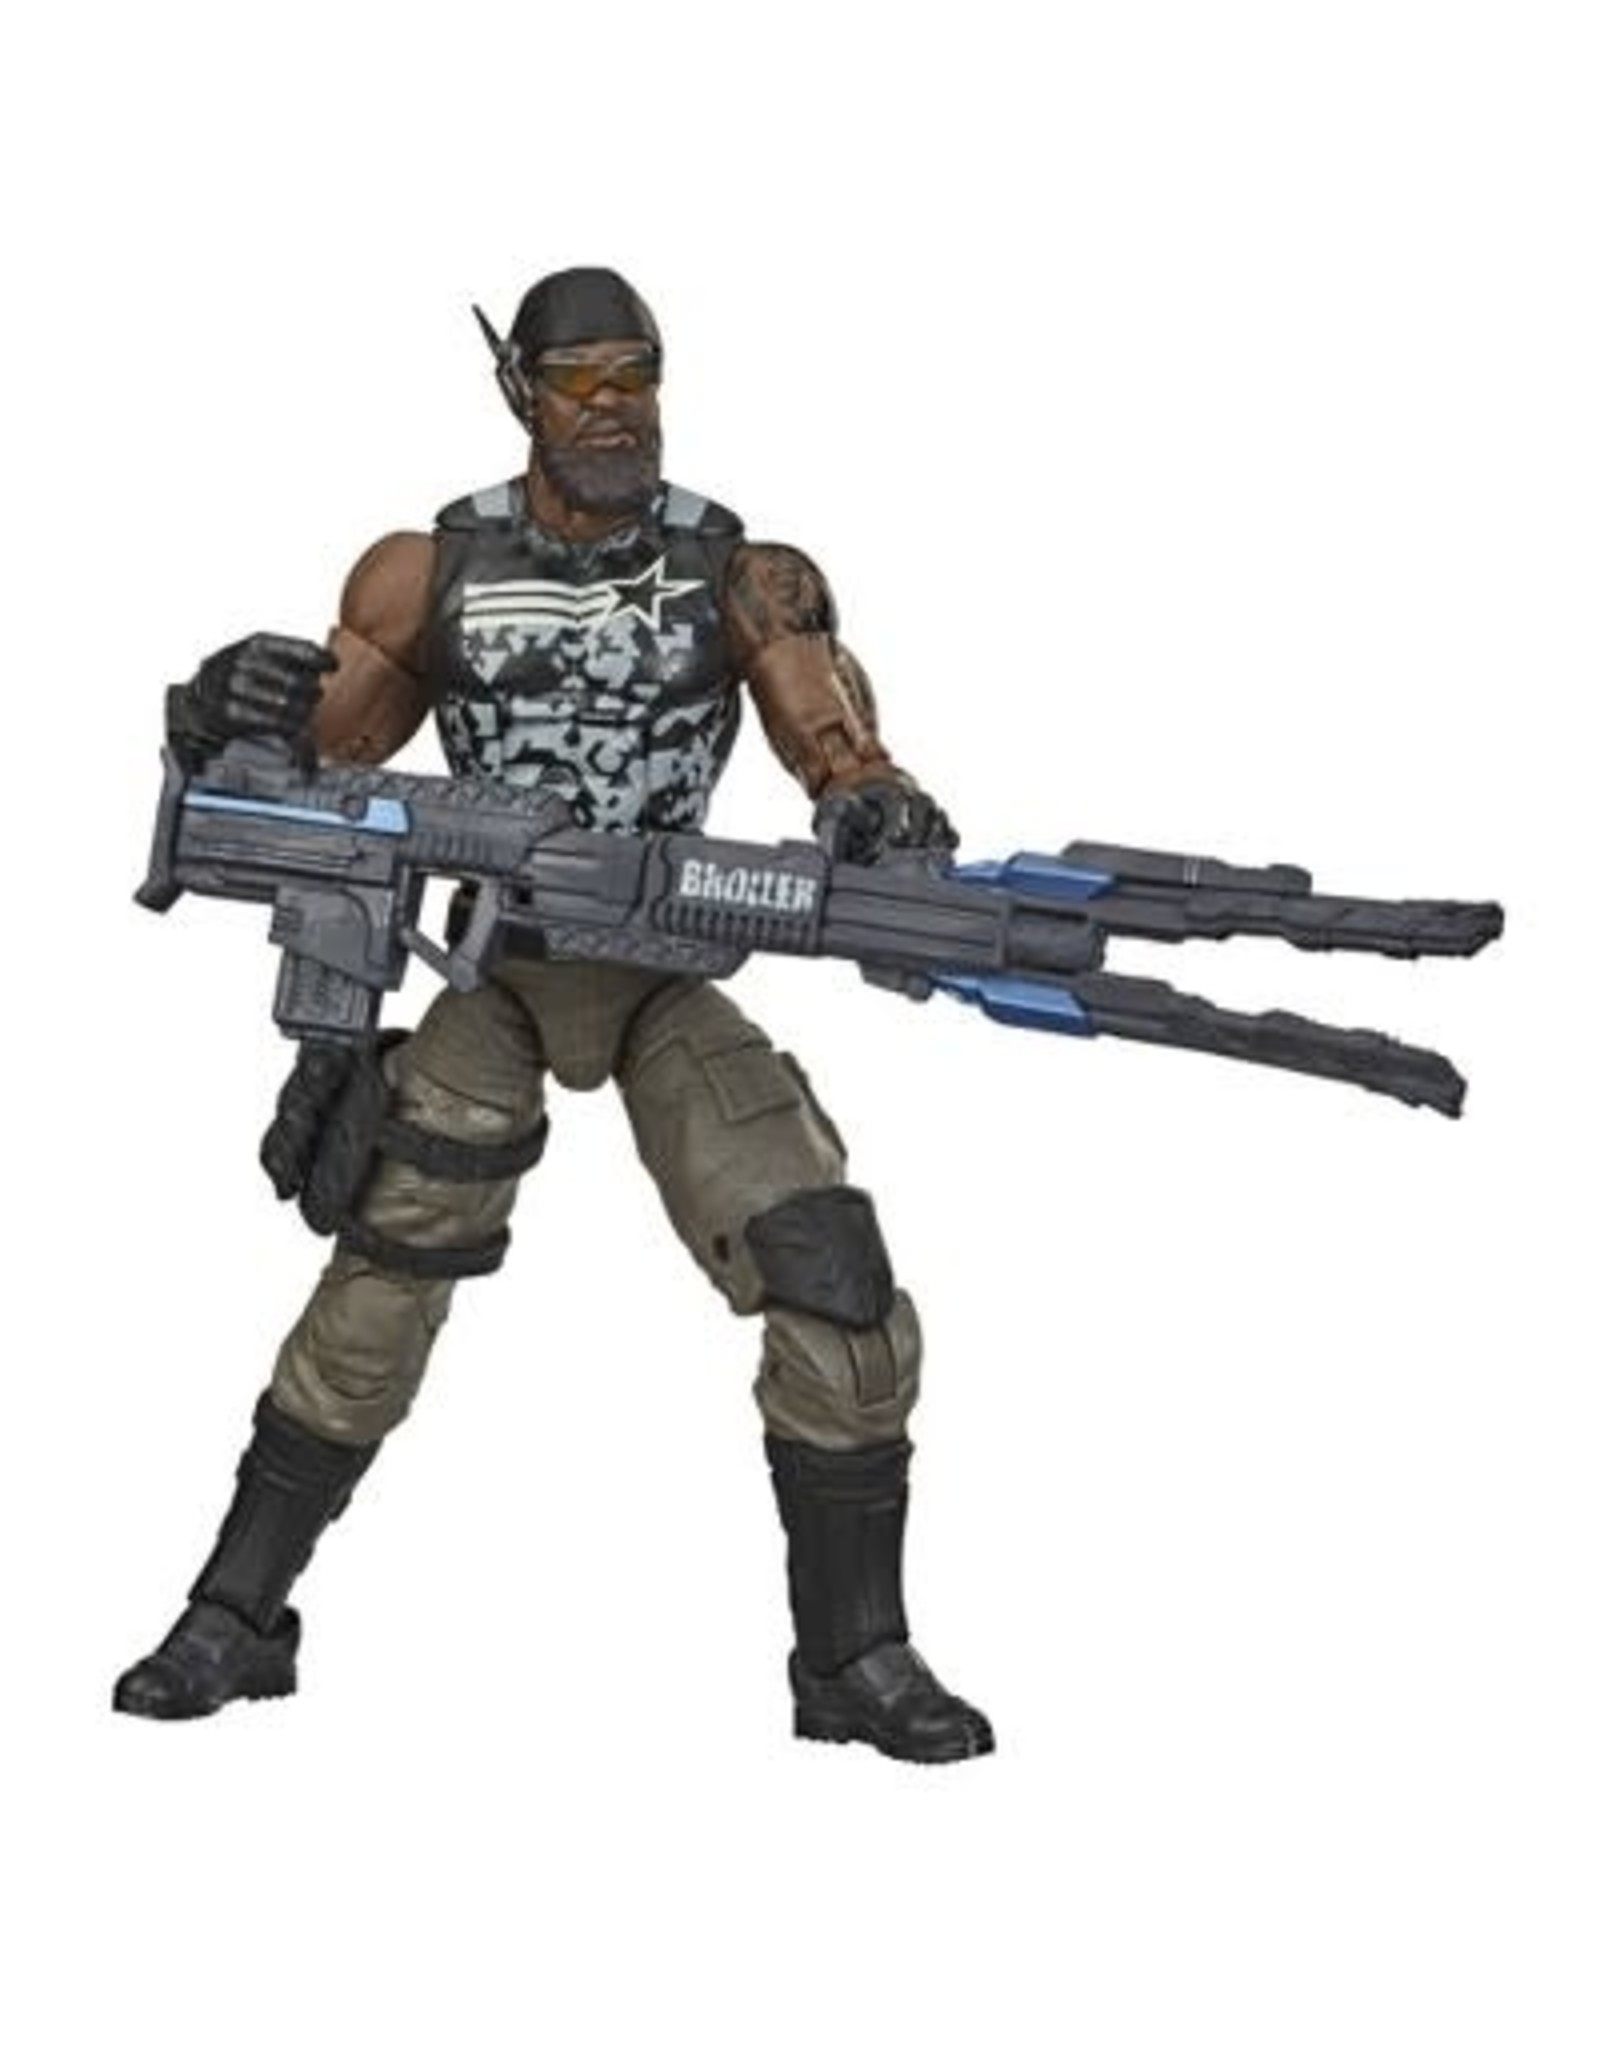 Hasbro G.I. Joe Classified Series Roadblock Exclusive Action Figure